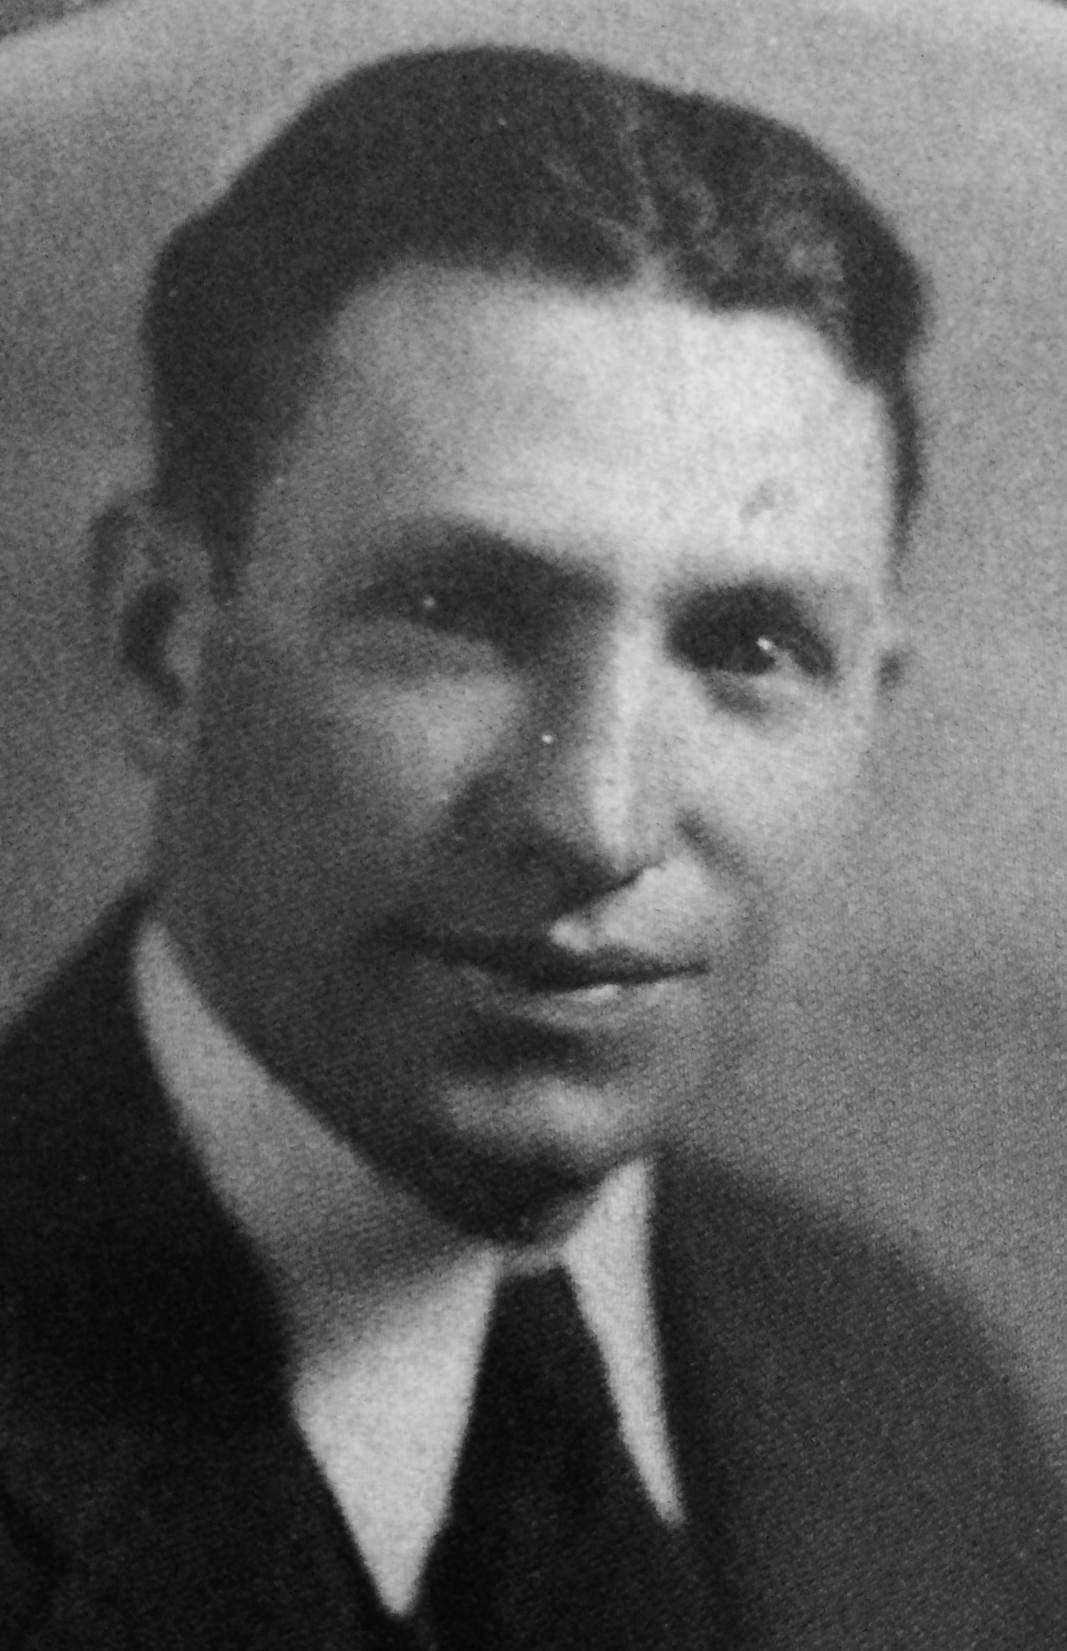 Armstrong, Howard Leroy